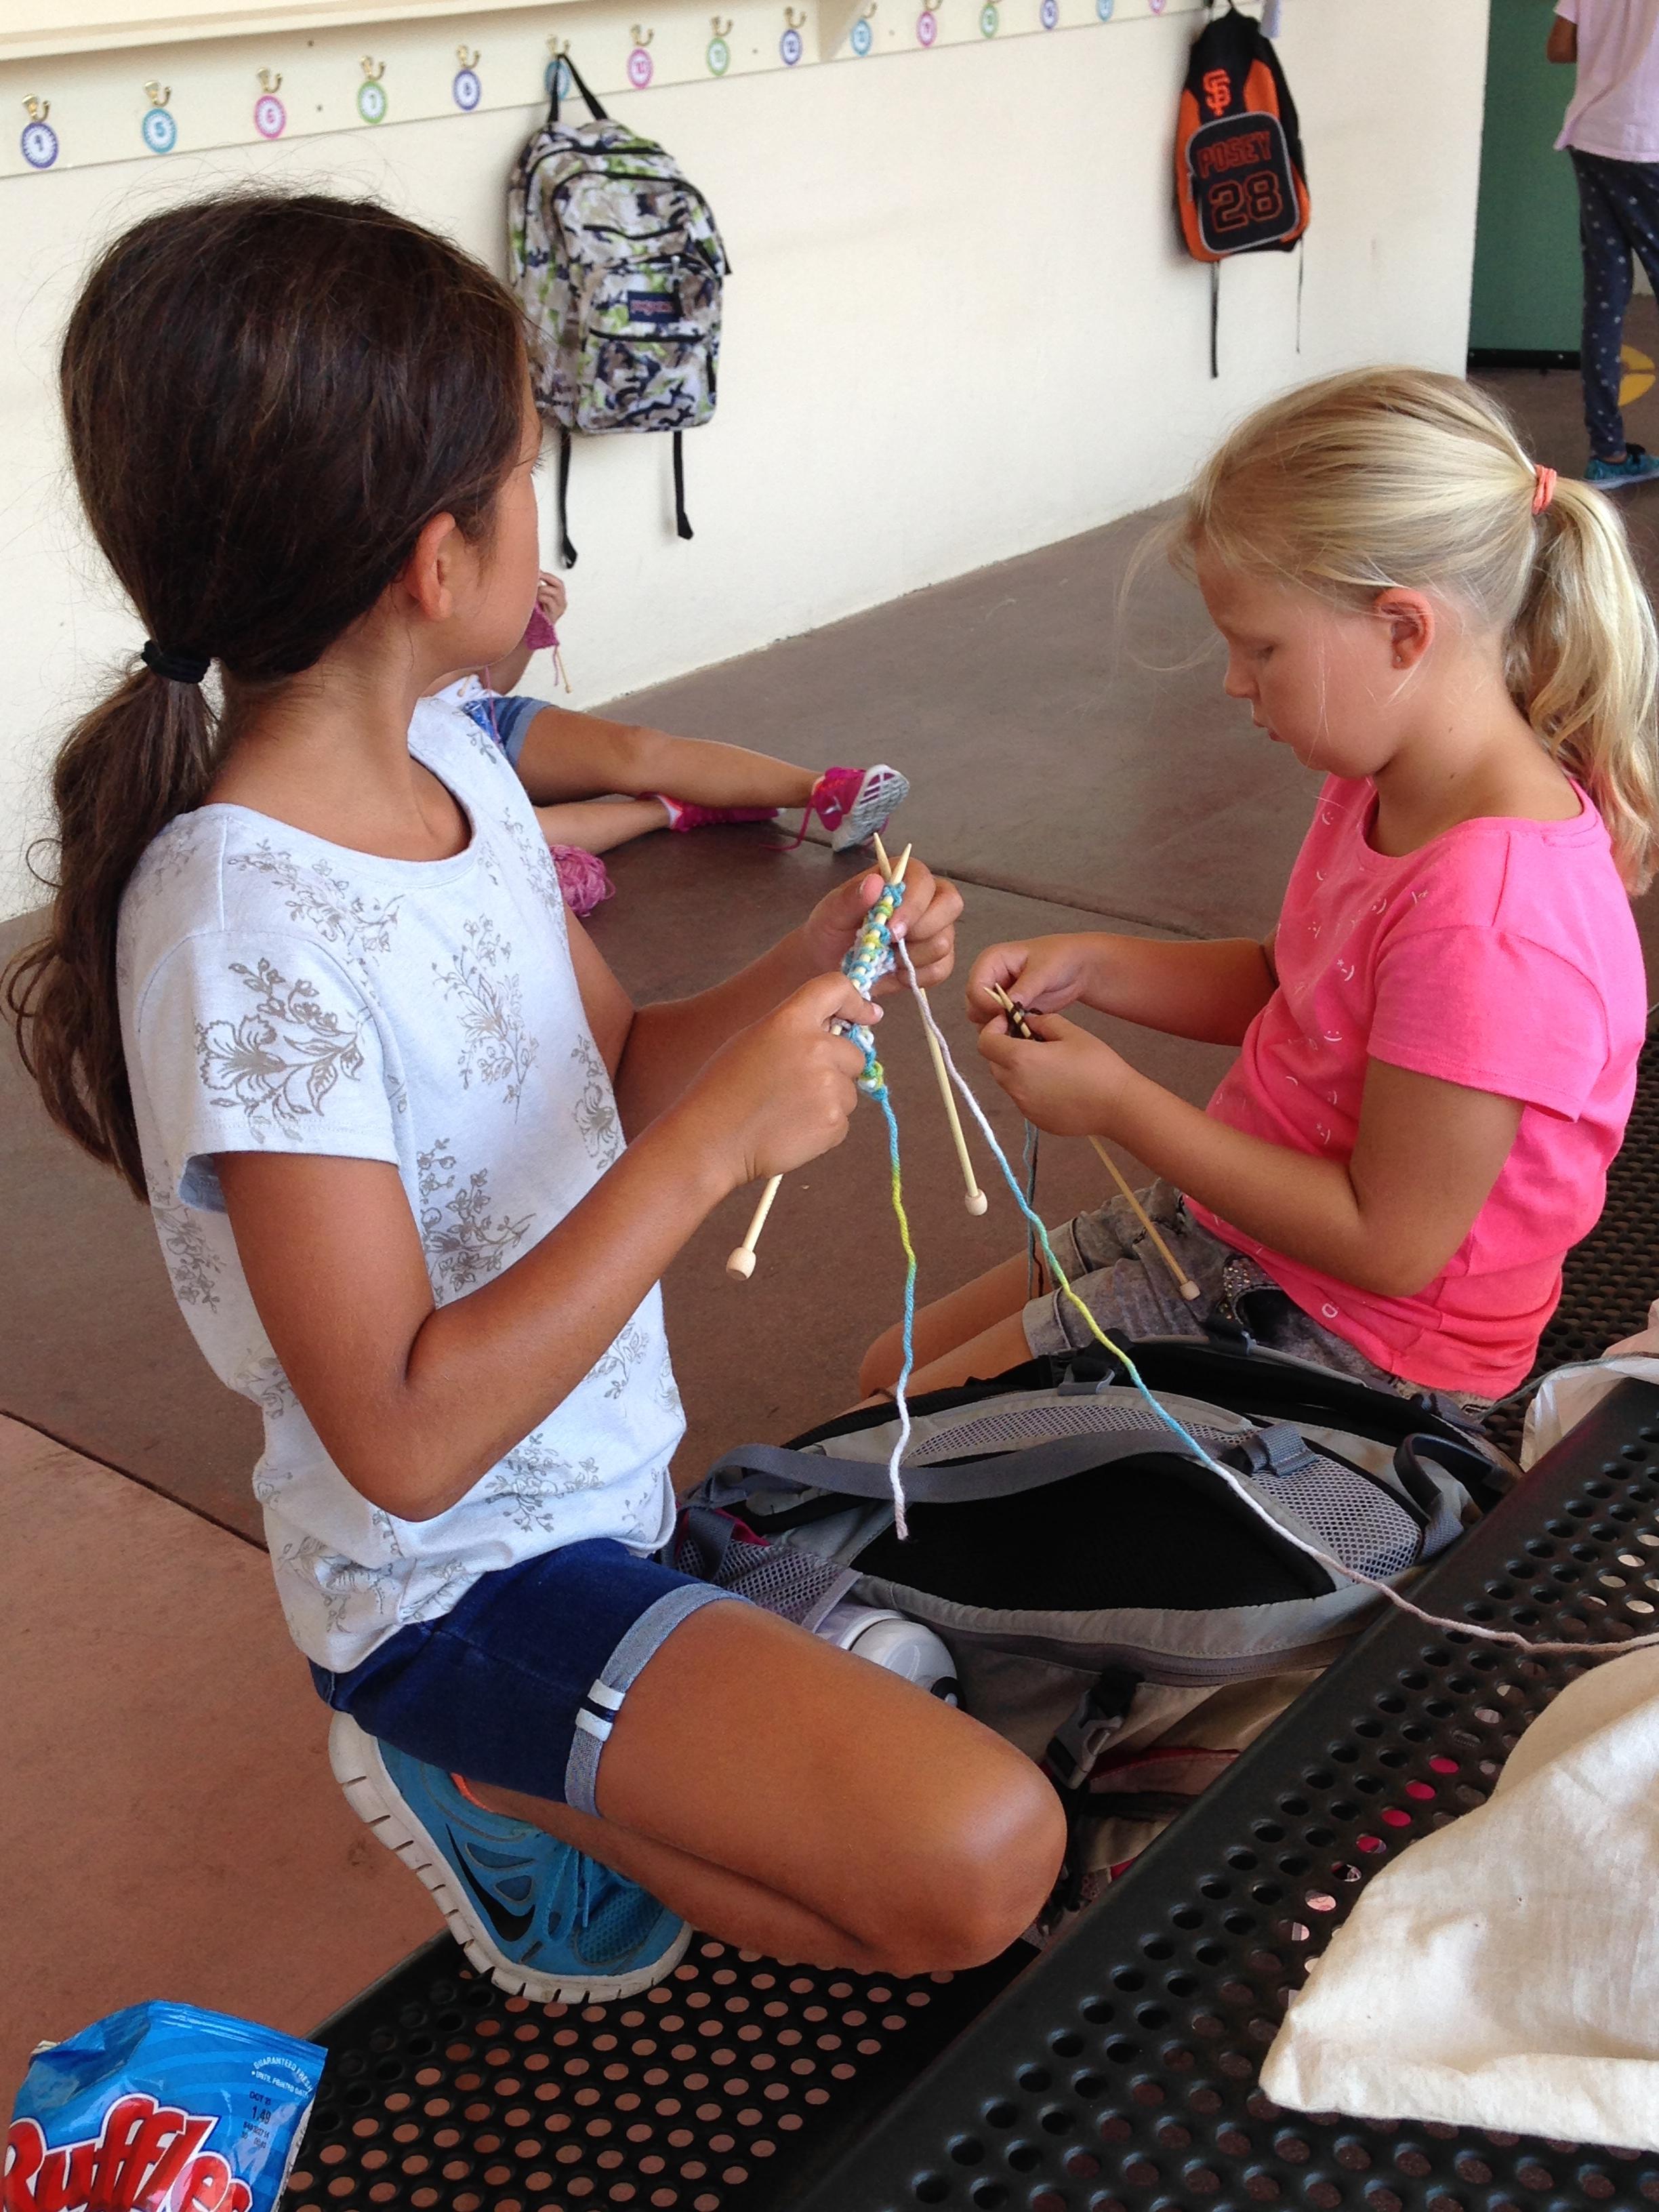 Chattin' and knittin'